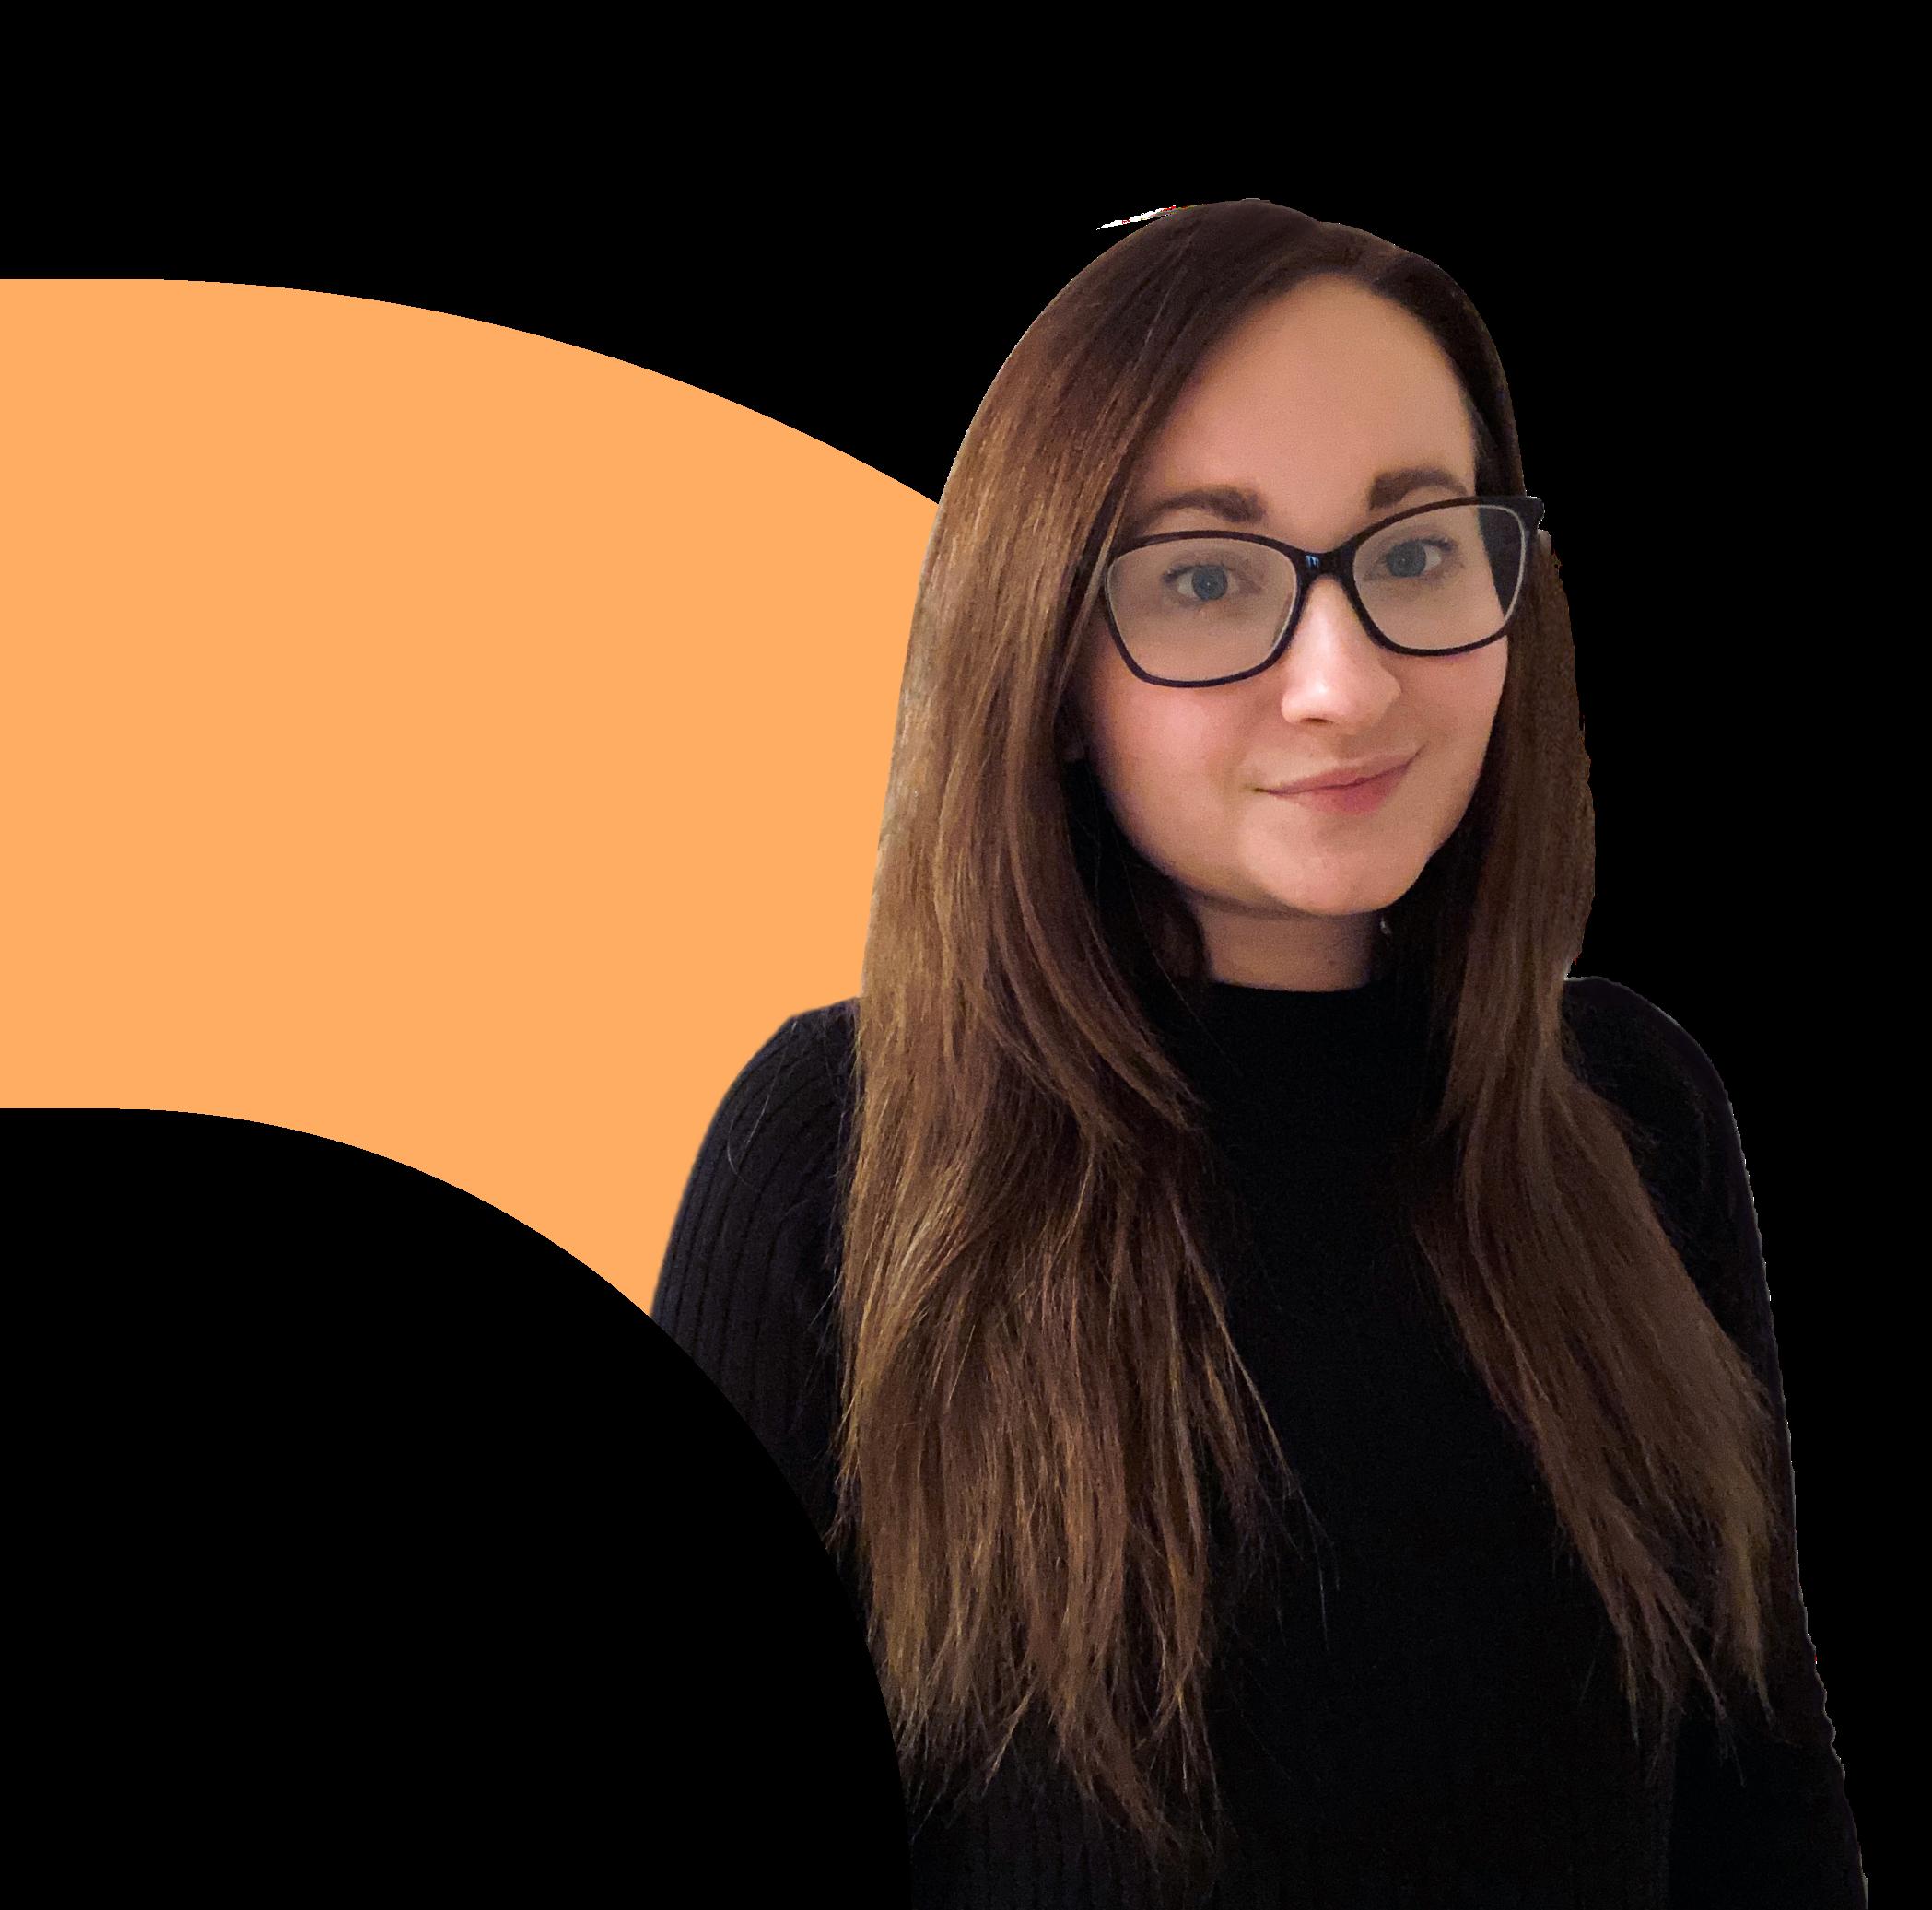 Chloe Easterlow, Product Designer at UNiDAYS